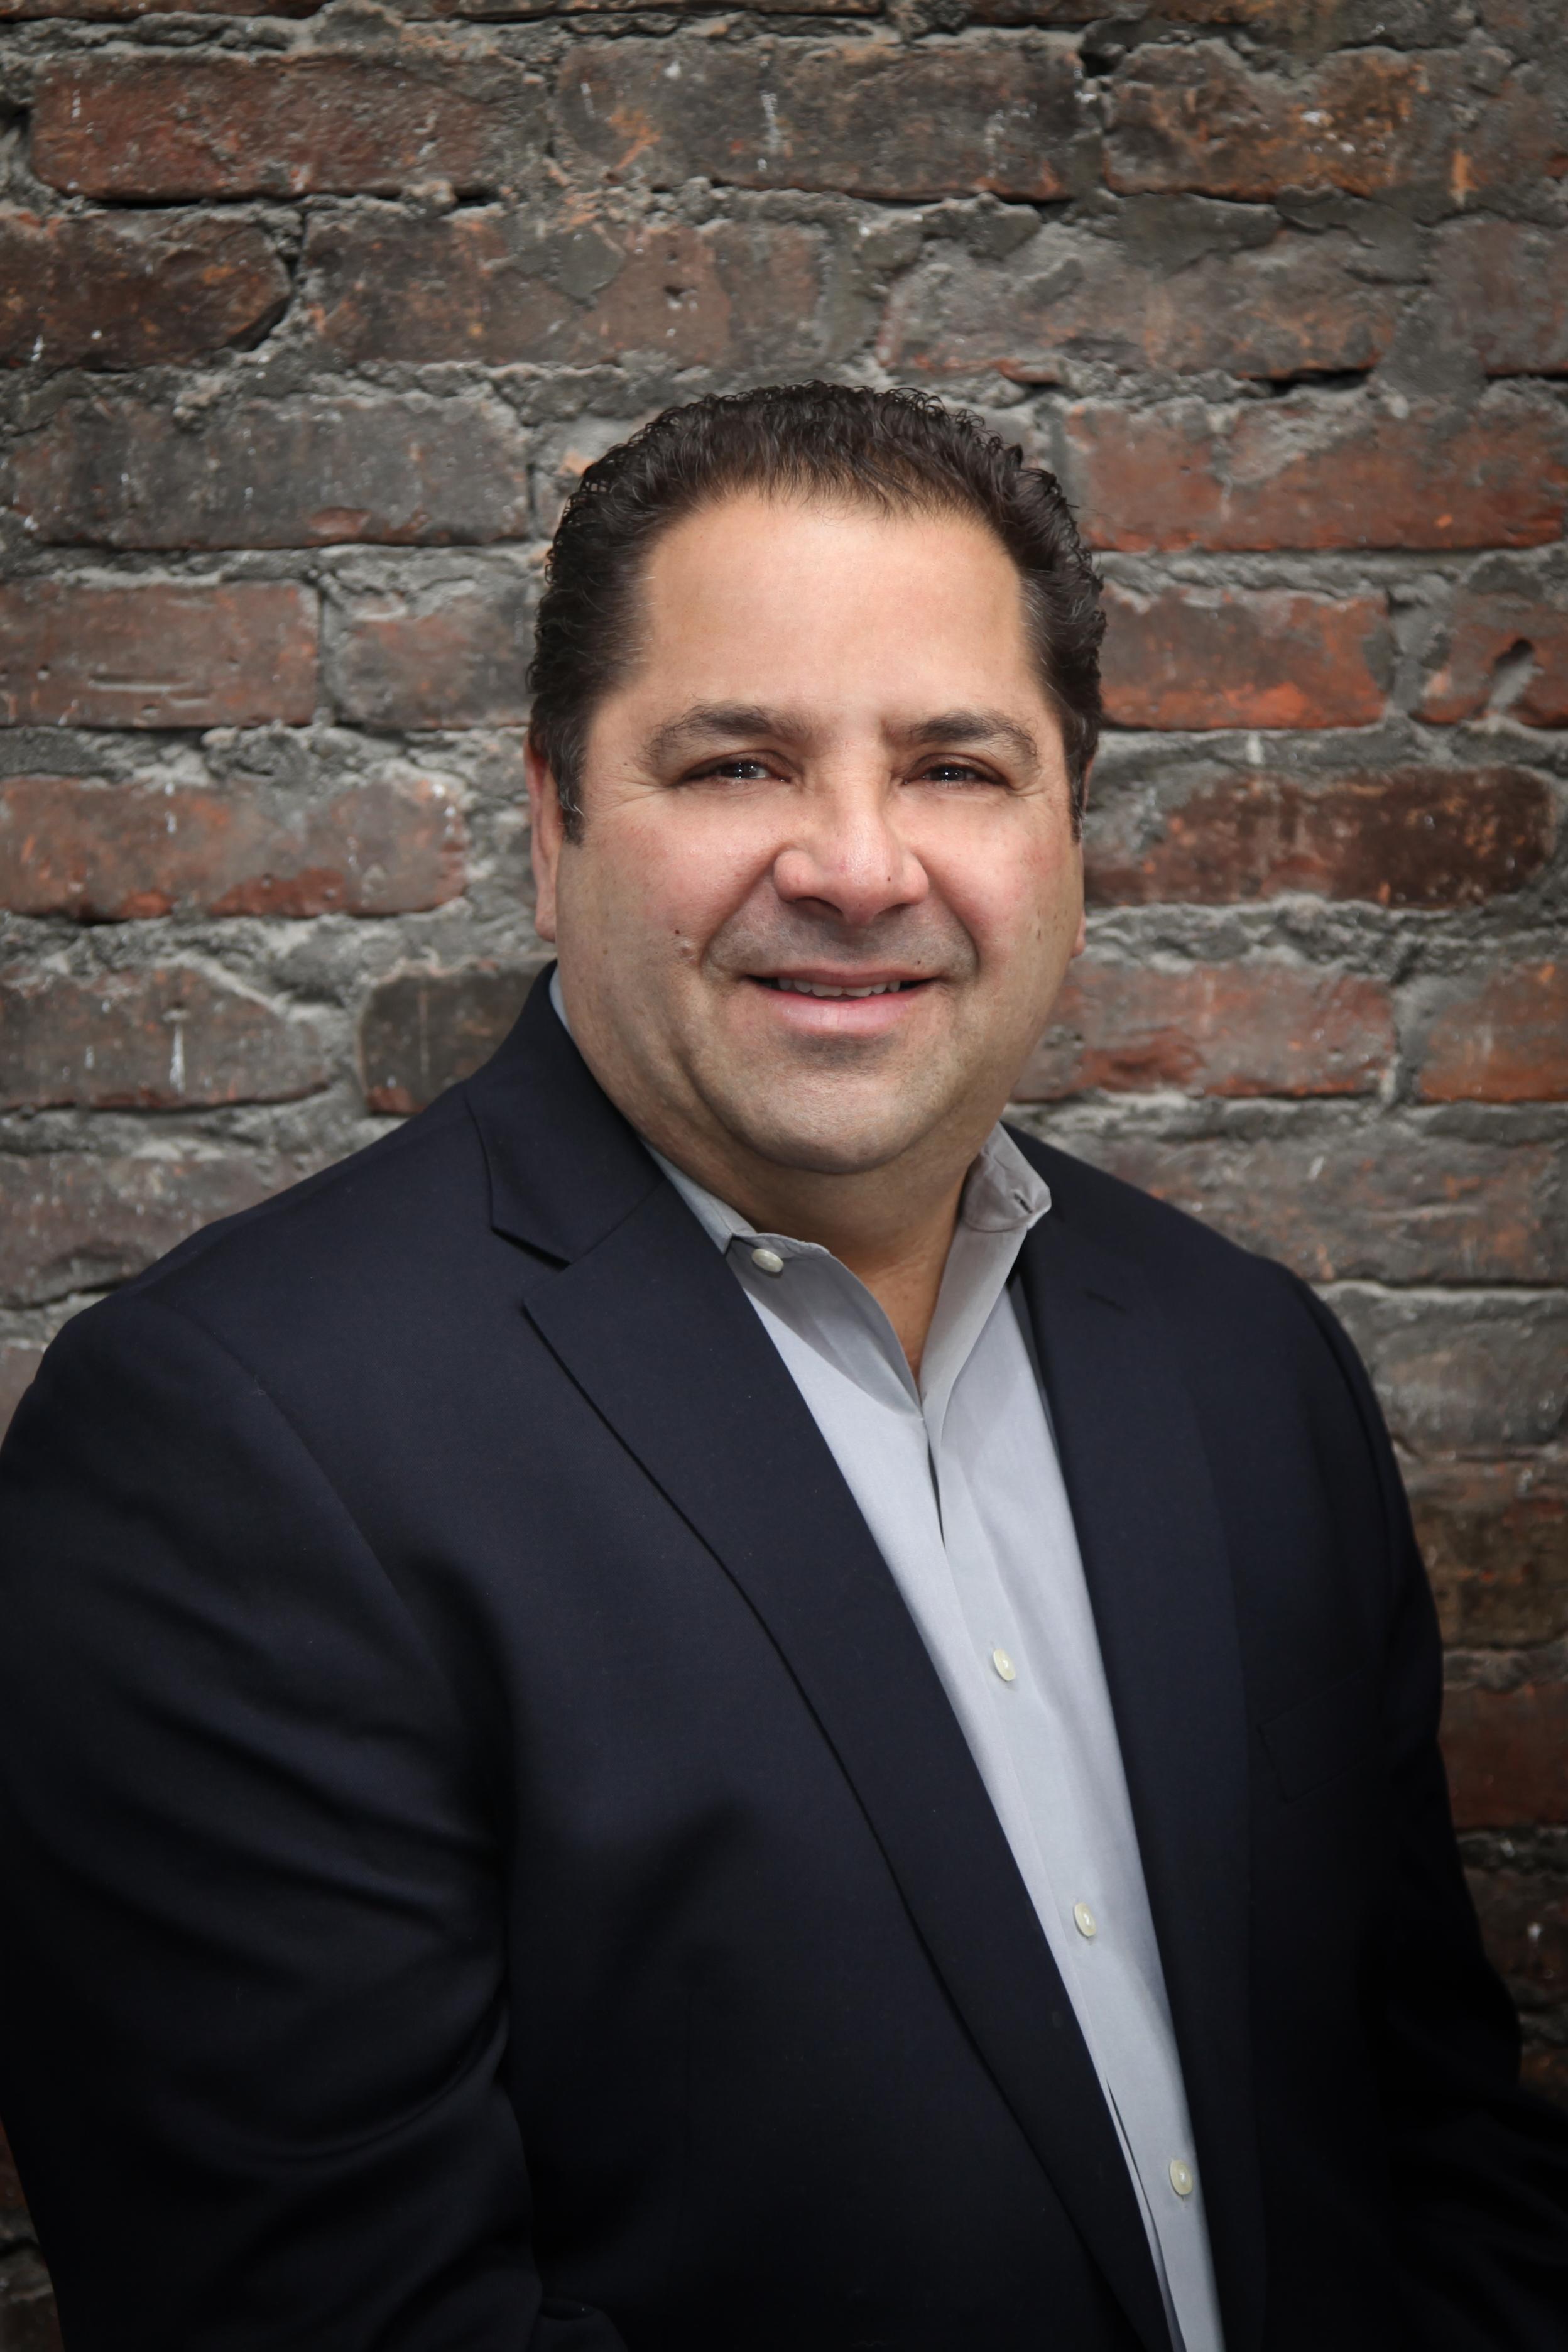 Steven Carmina, AIA, President